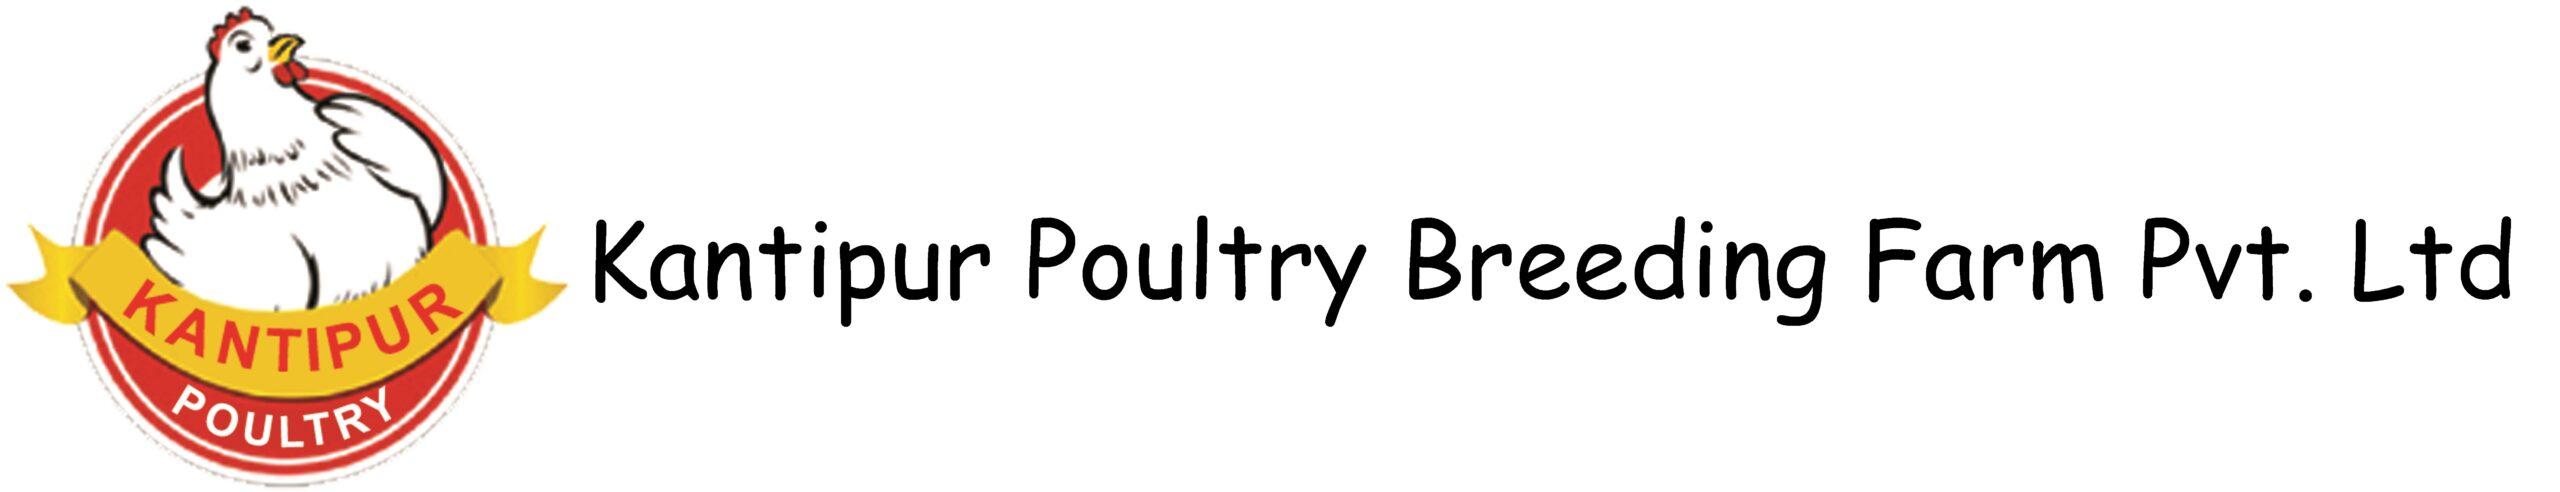 Kantipur Poultry Breeding Farm